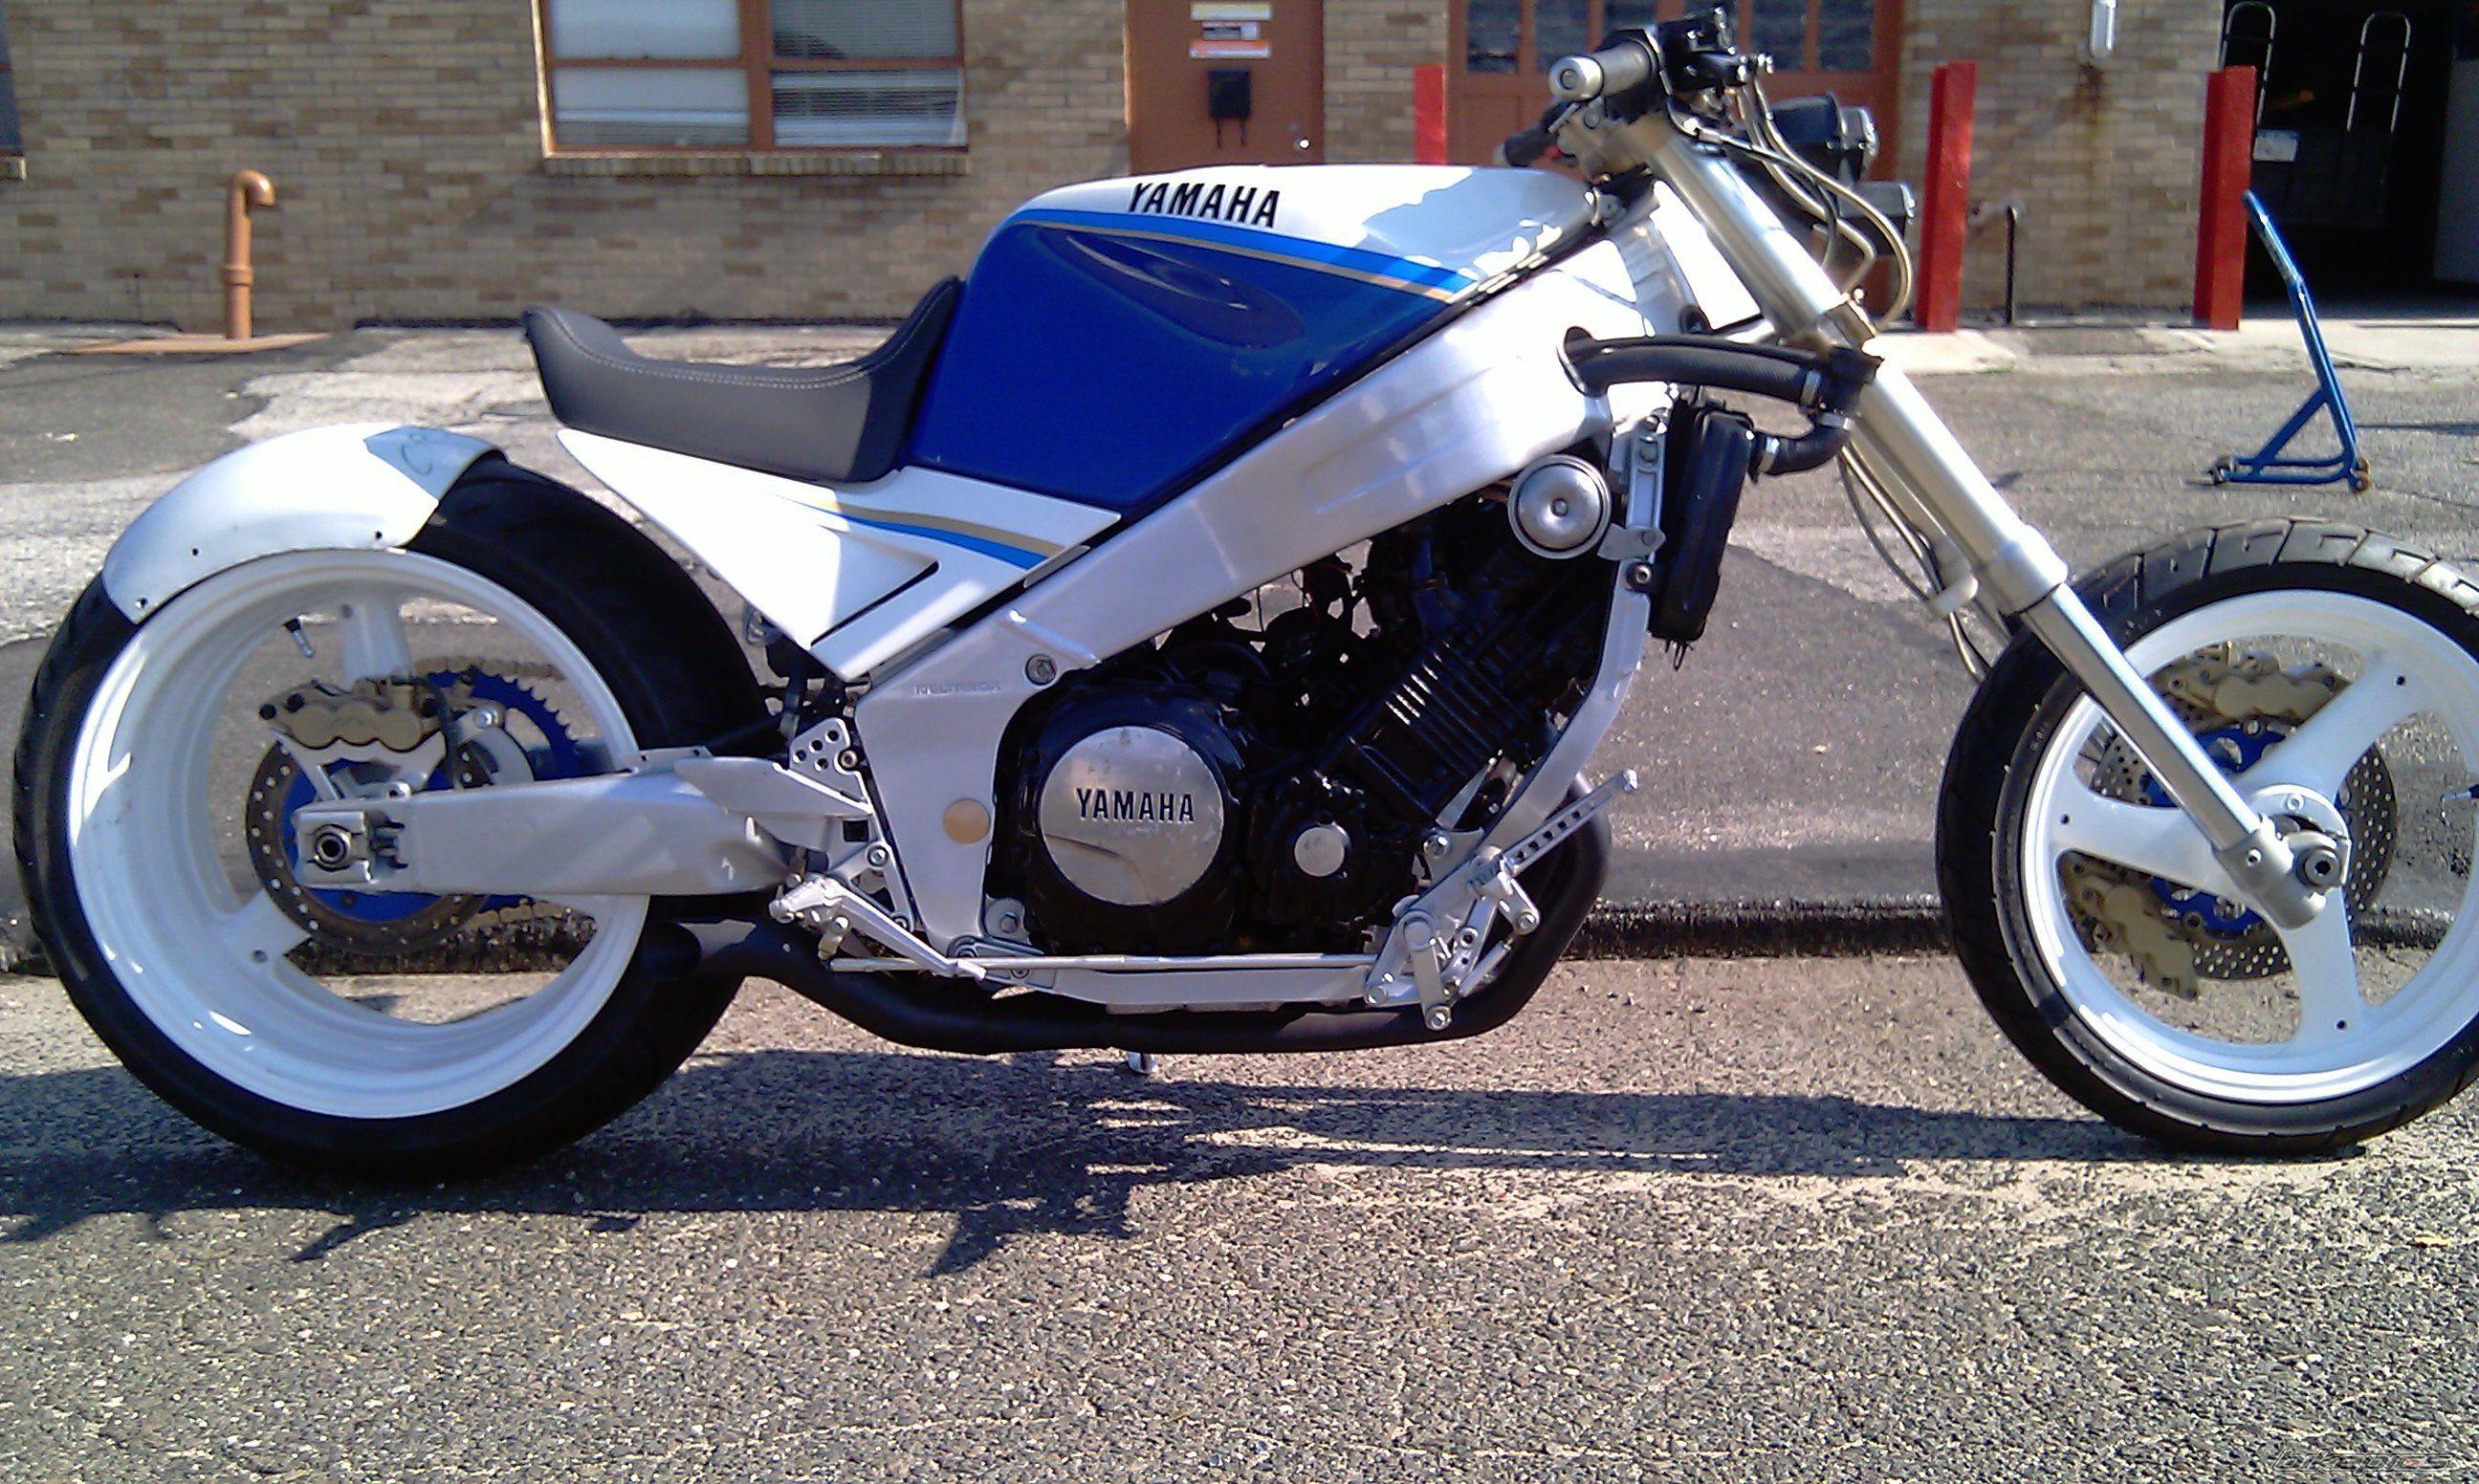 1988 Yamaha FZR 1000